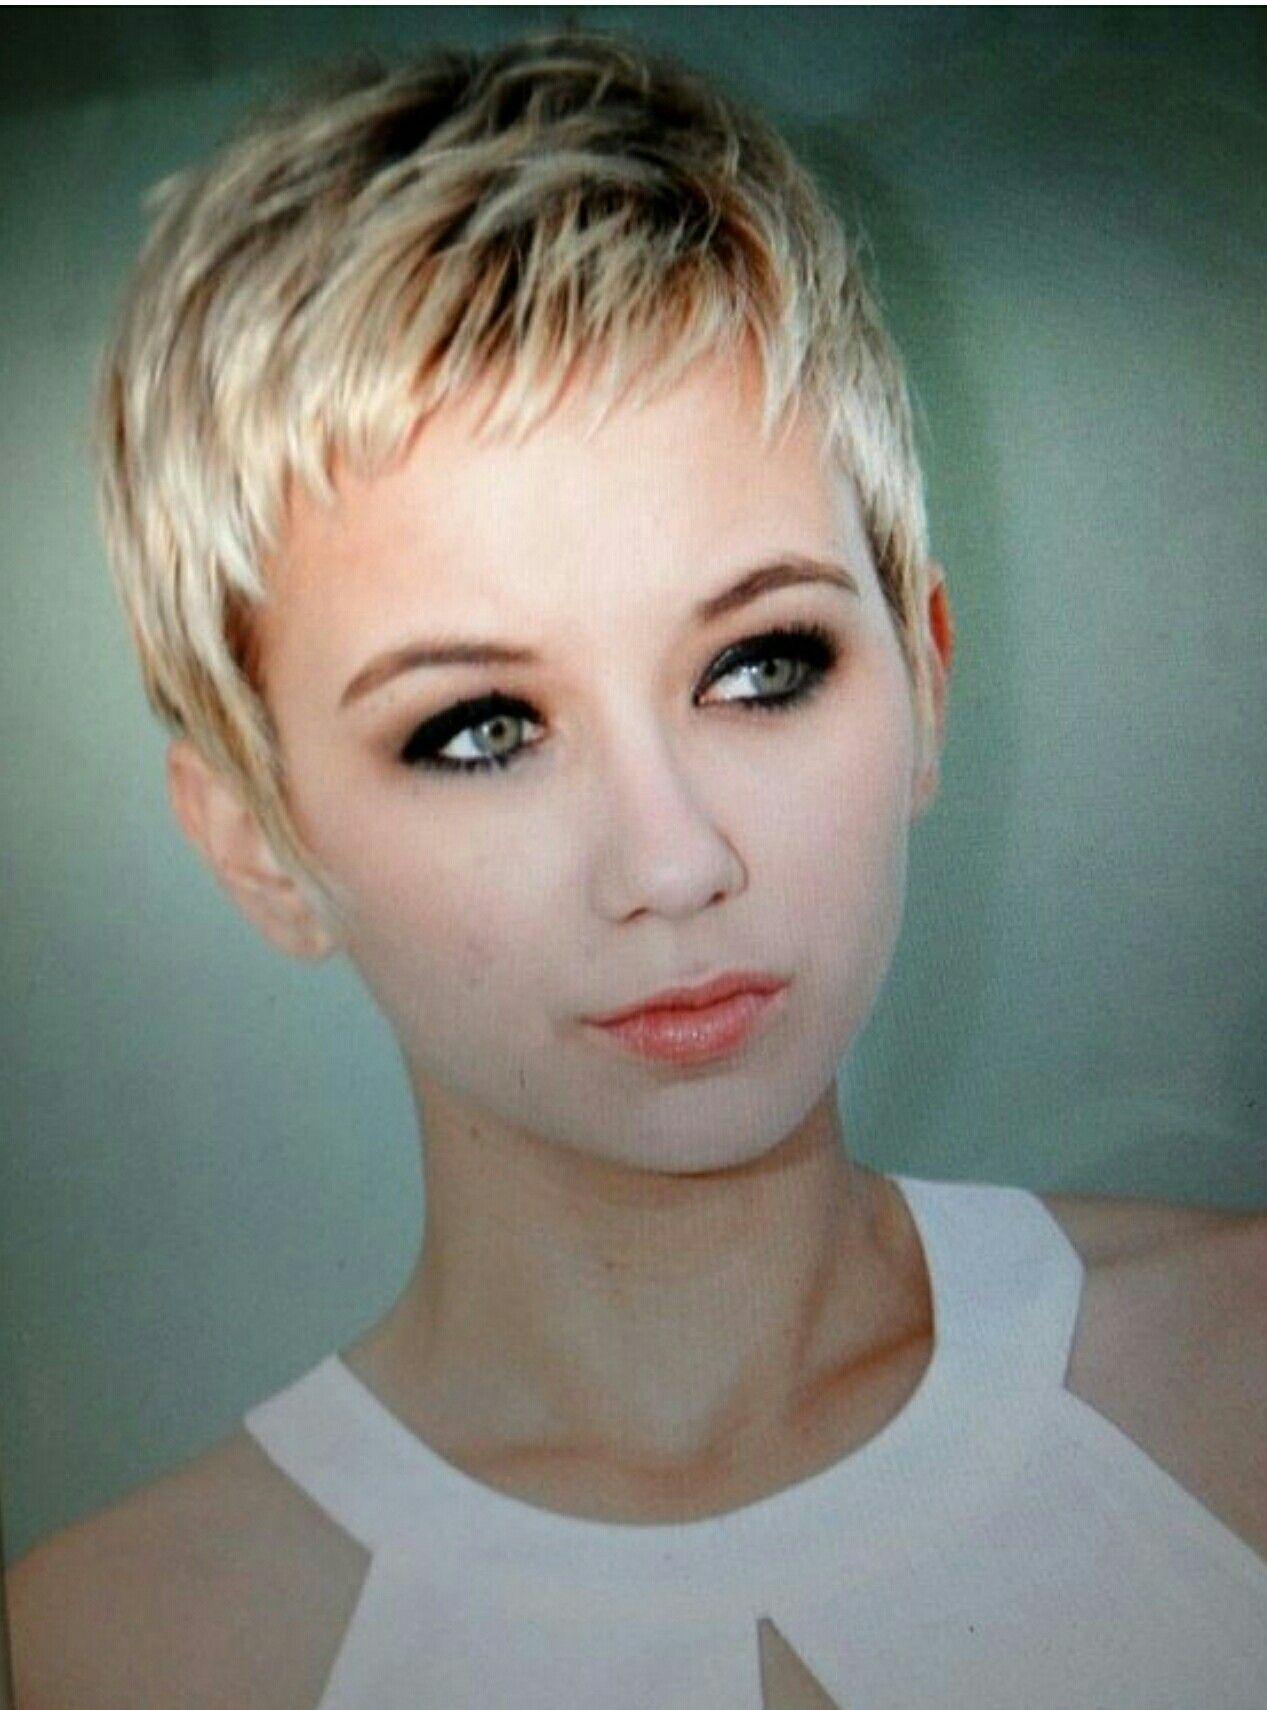 Boy hairstyle in short hair blond en kort  alternative hair  pinterest  alternative